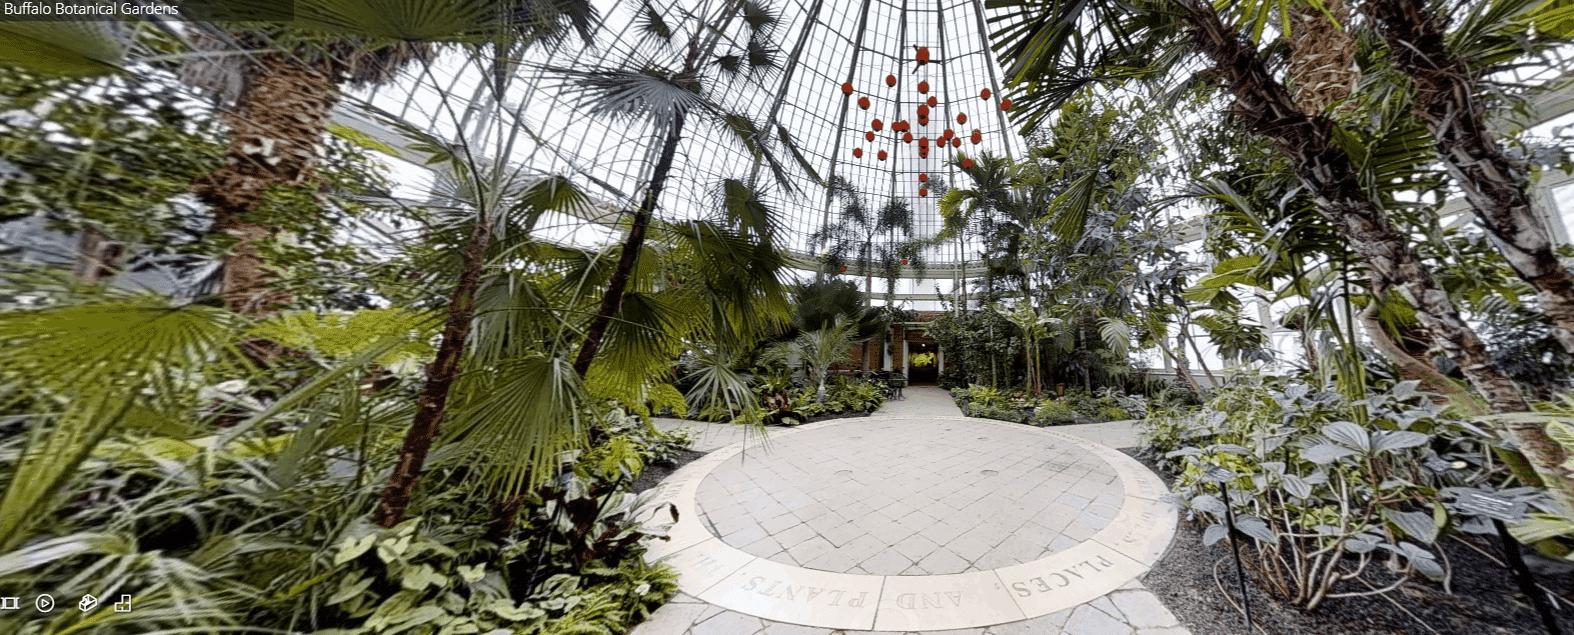 3d Landmark Scan Botanical Gardens 360 Virtual Tour Co